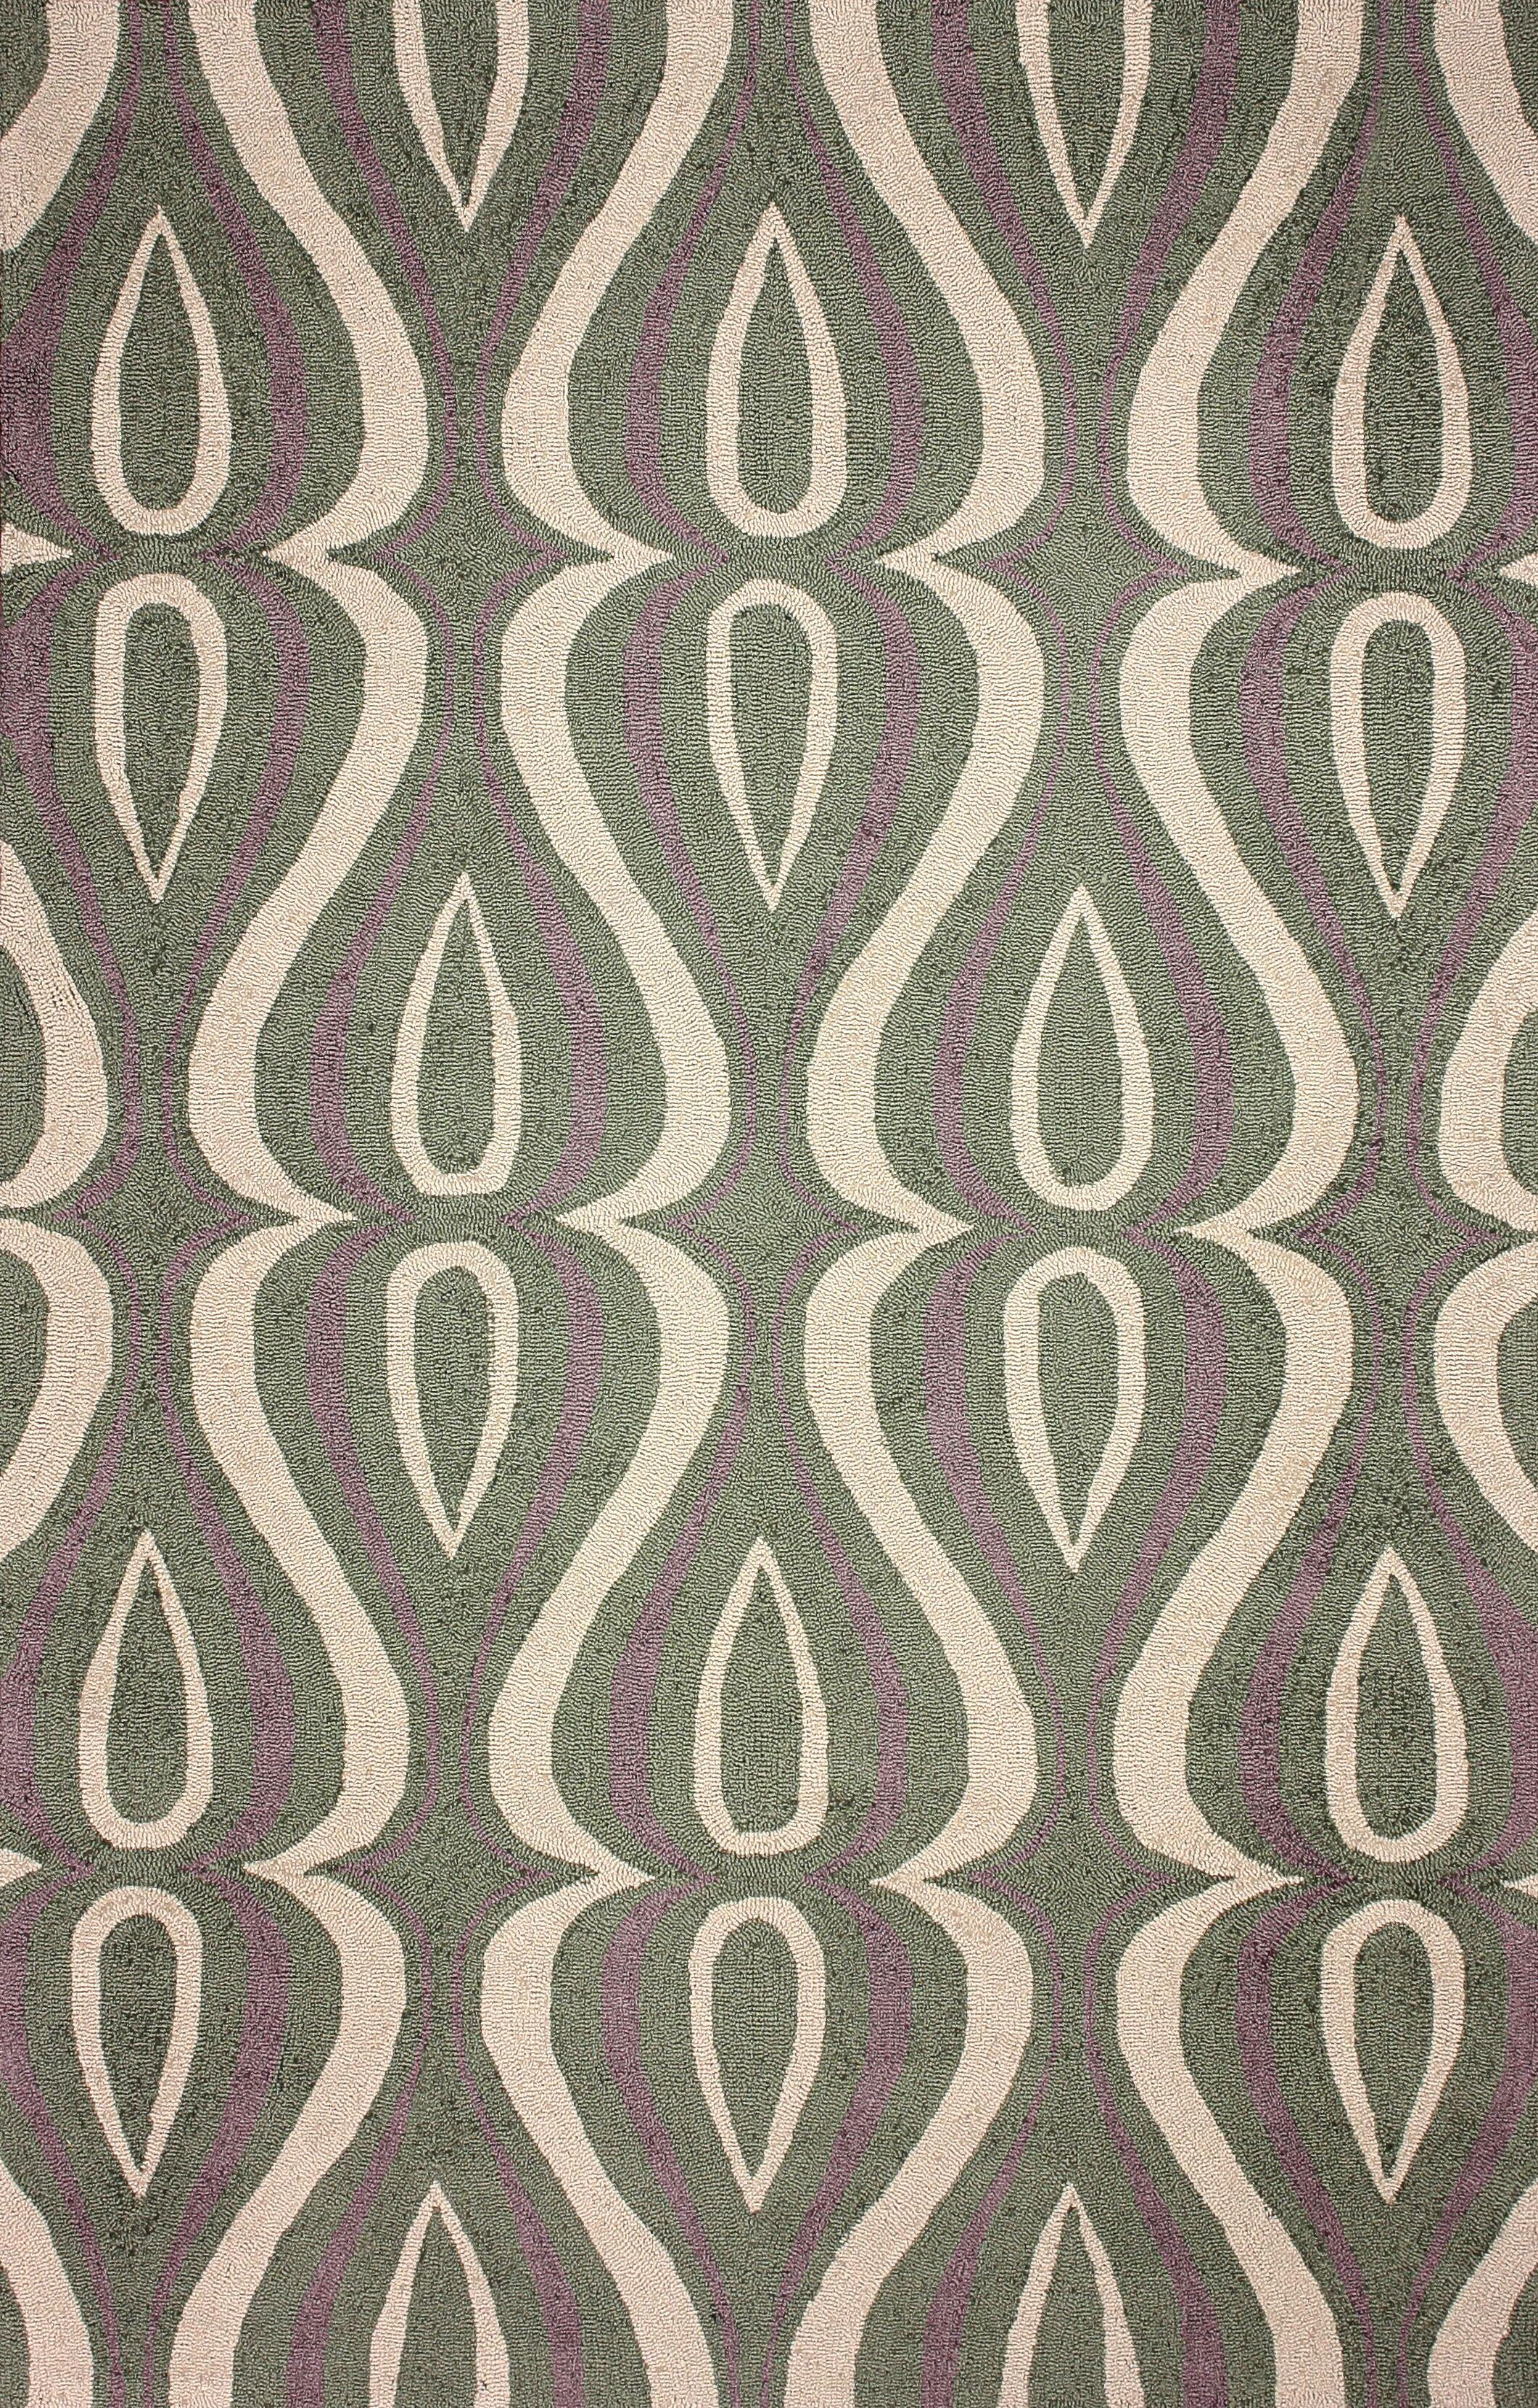 Uzbek Green Luciano Rug Rug Size: Rectangle 5' x 8'